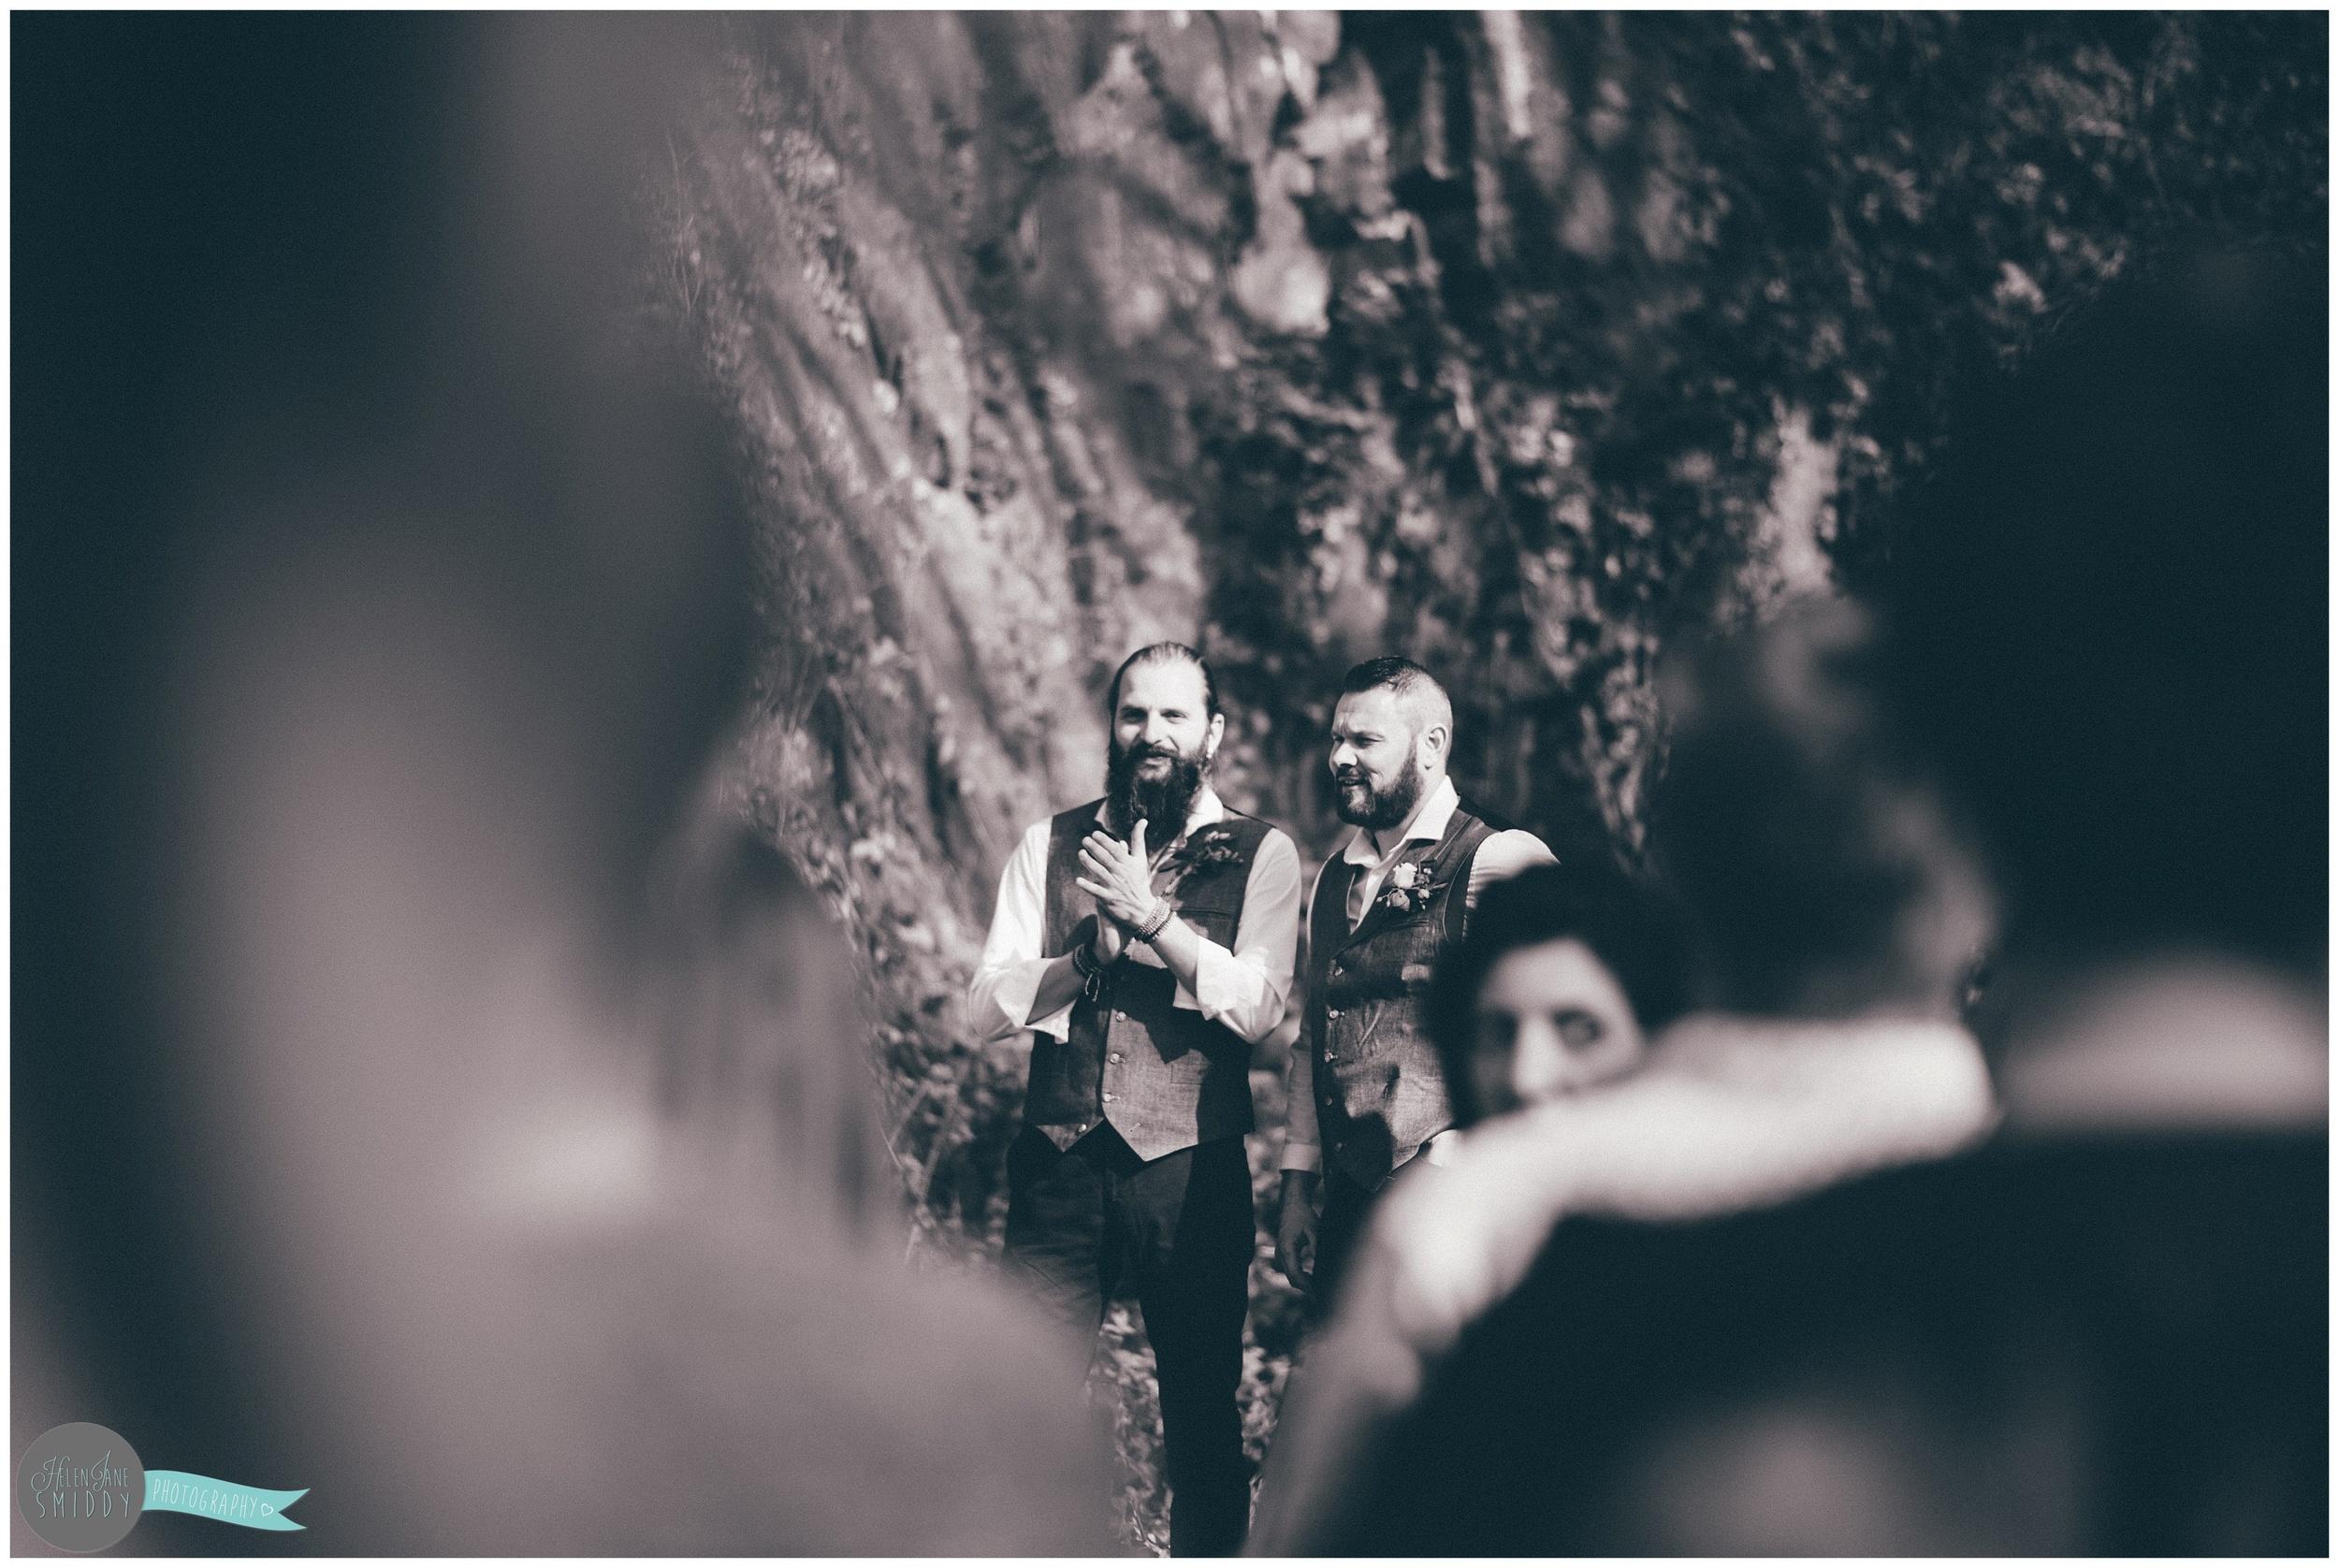 secret-wedding-ceremony-photography -snap-festival-boho-chic-vintage-wales-fforest-shabby-chic-cheshire